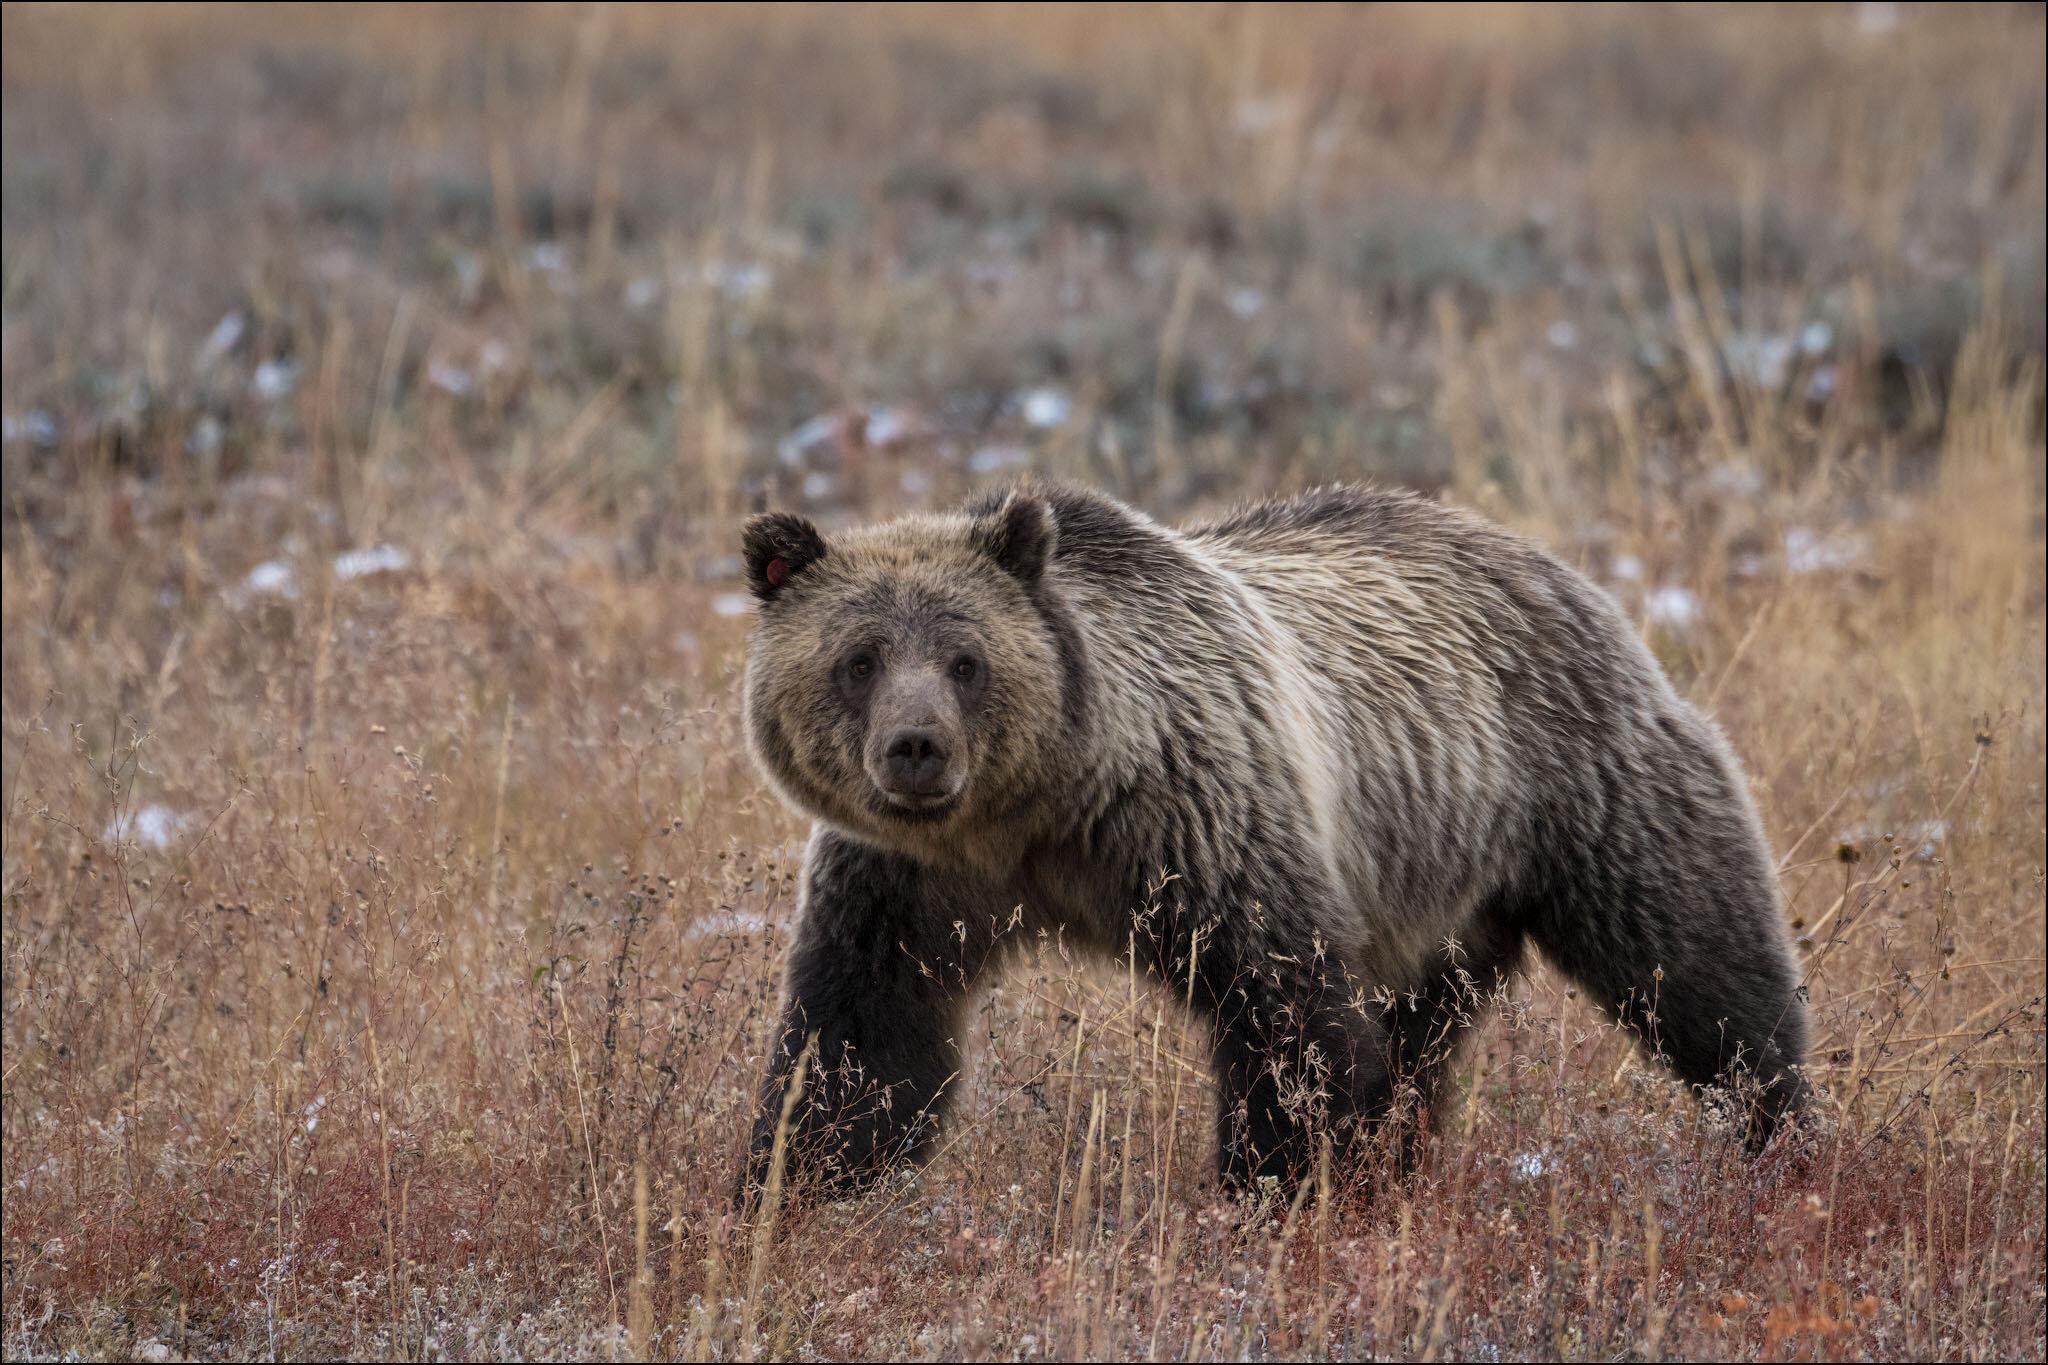 Grizzly bear (female) near Pebble Creek in Grand Teton National Park, Wyoming, USA.